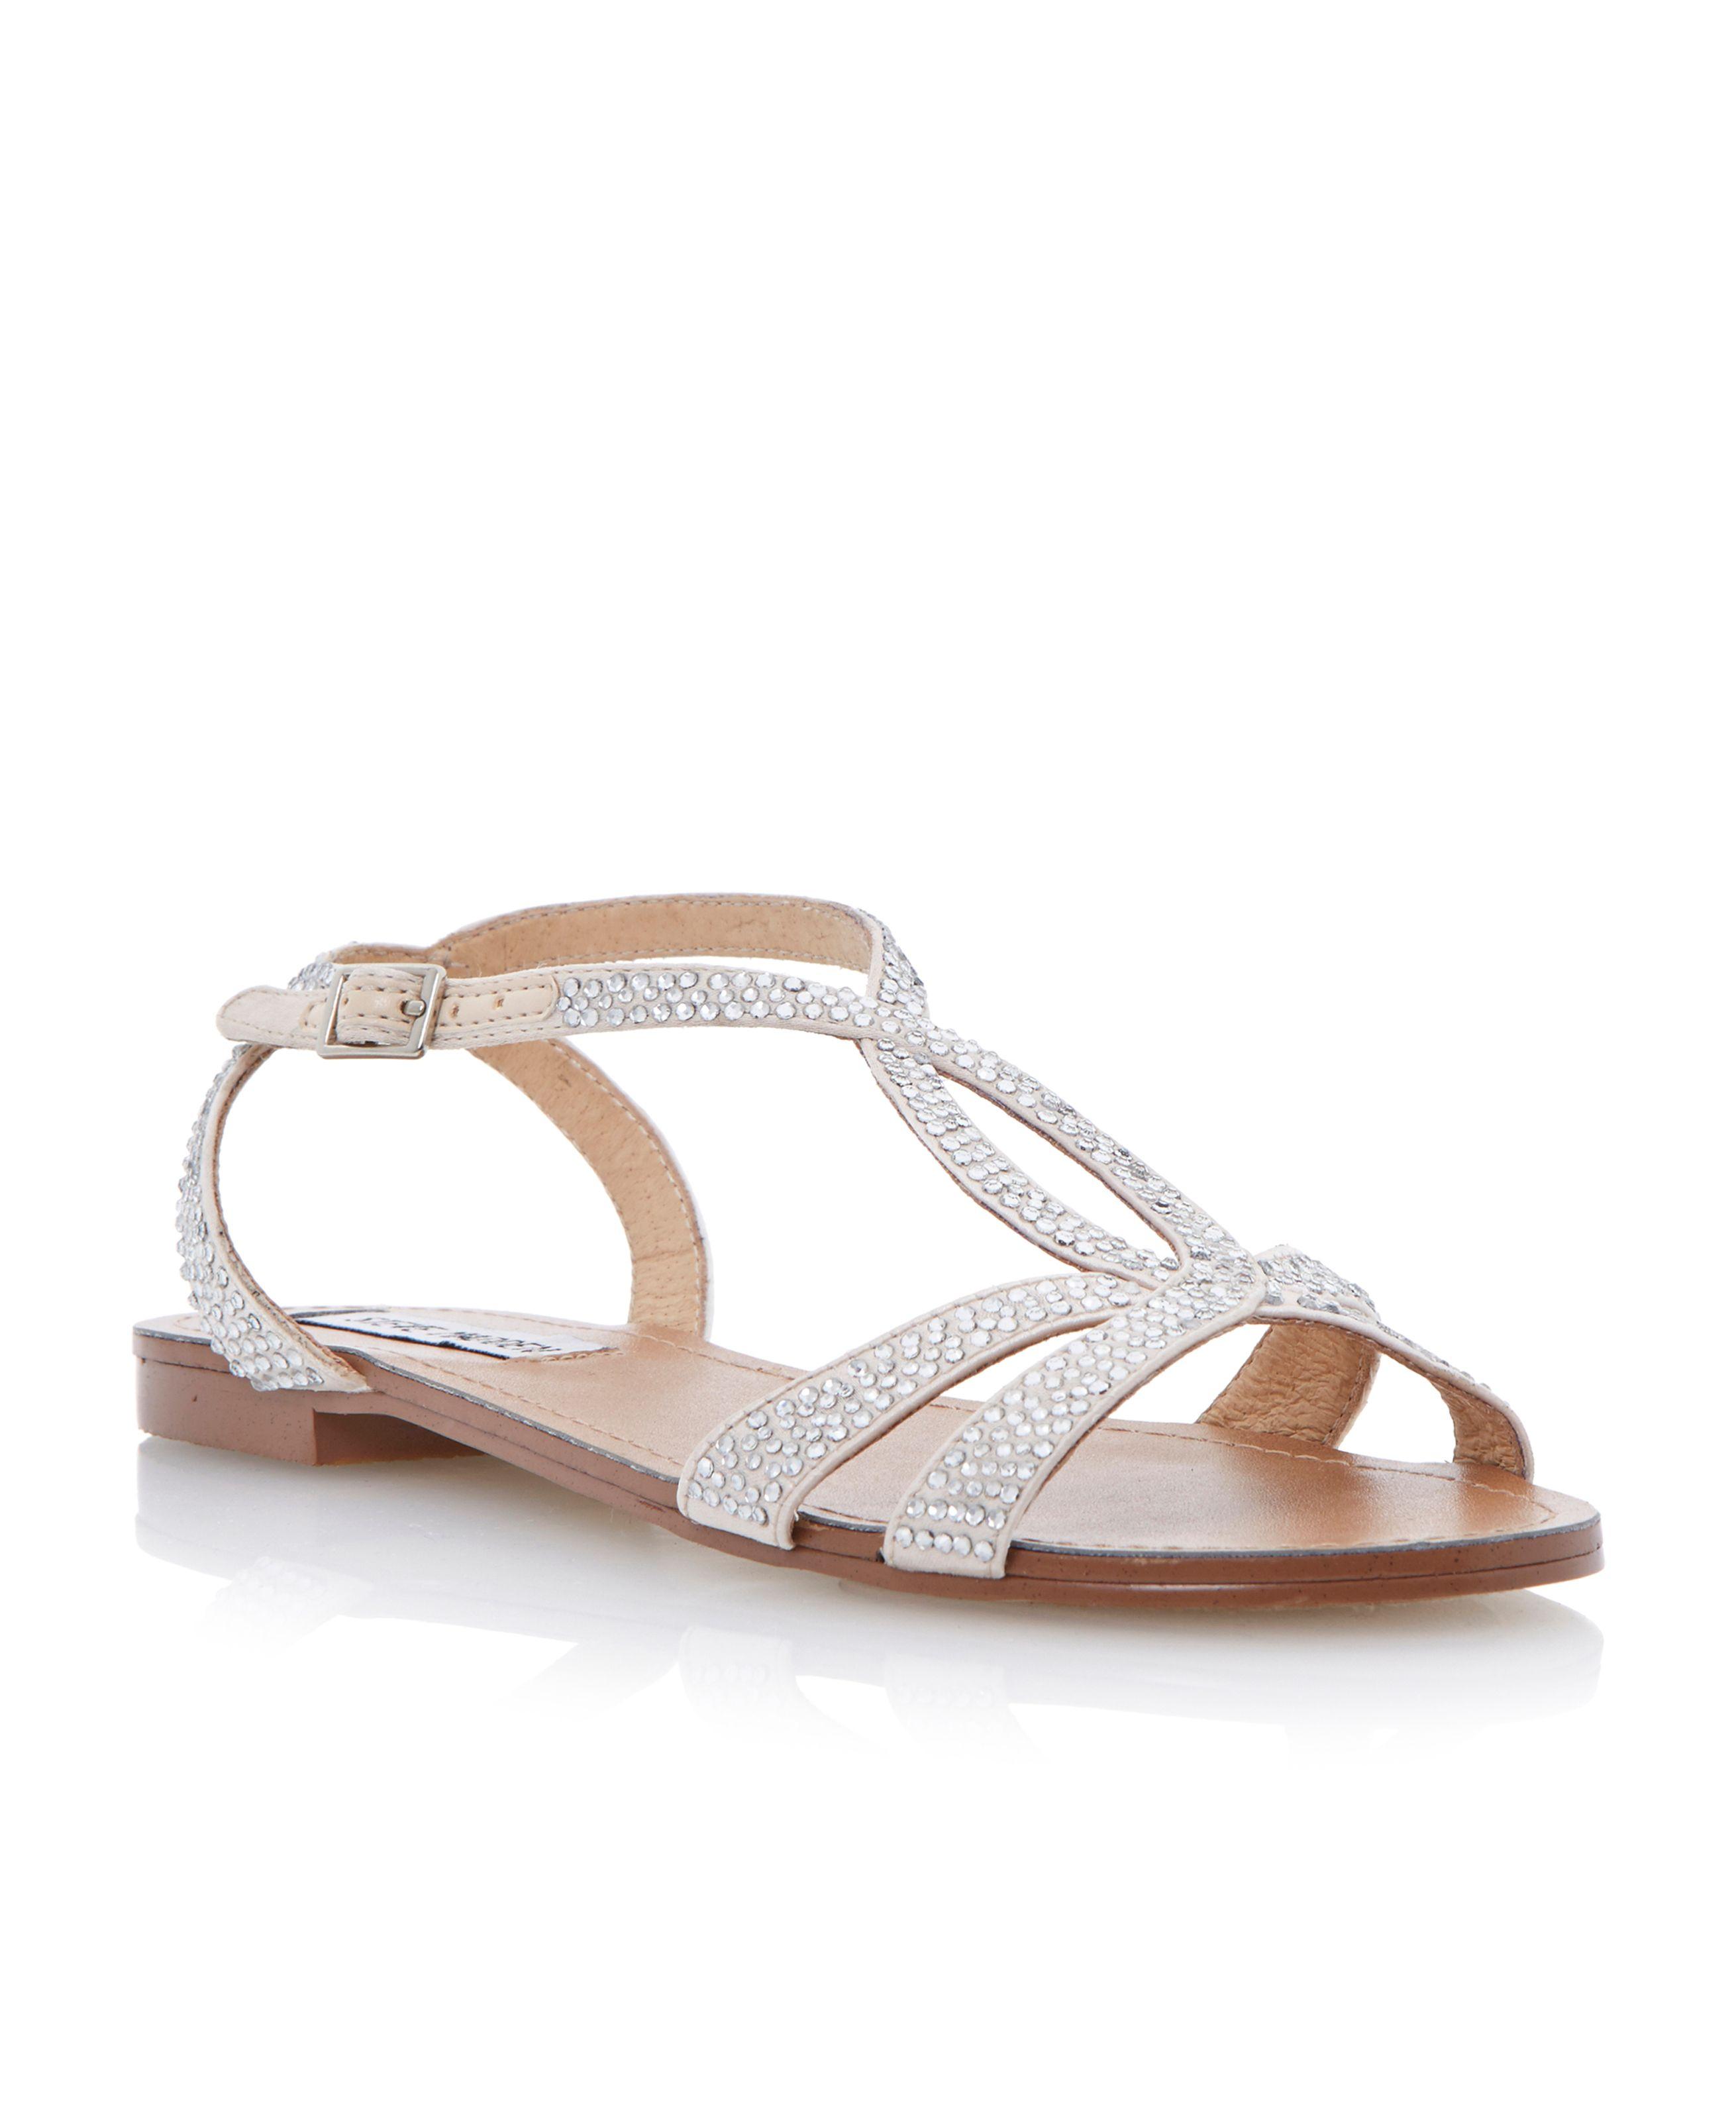 Steve madden Starrz Diamante Crossover Flat Sandals in ...